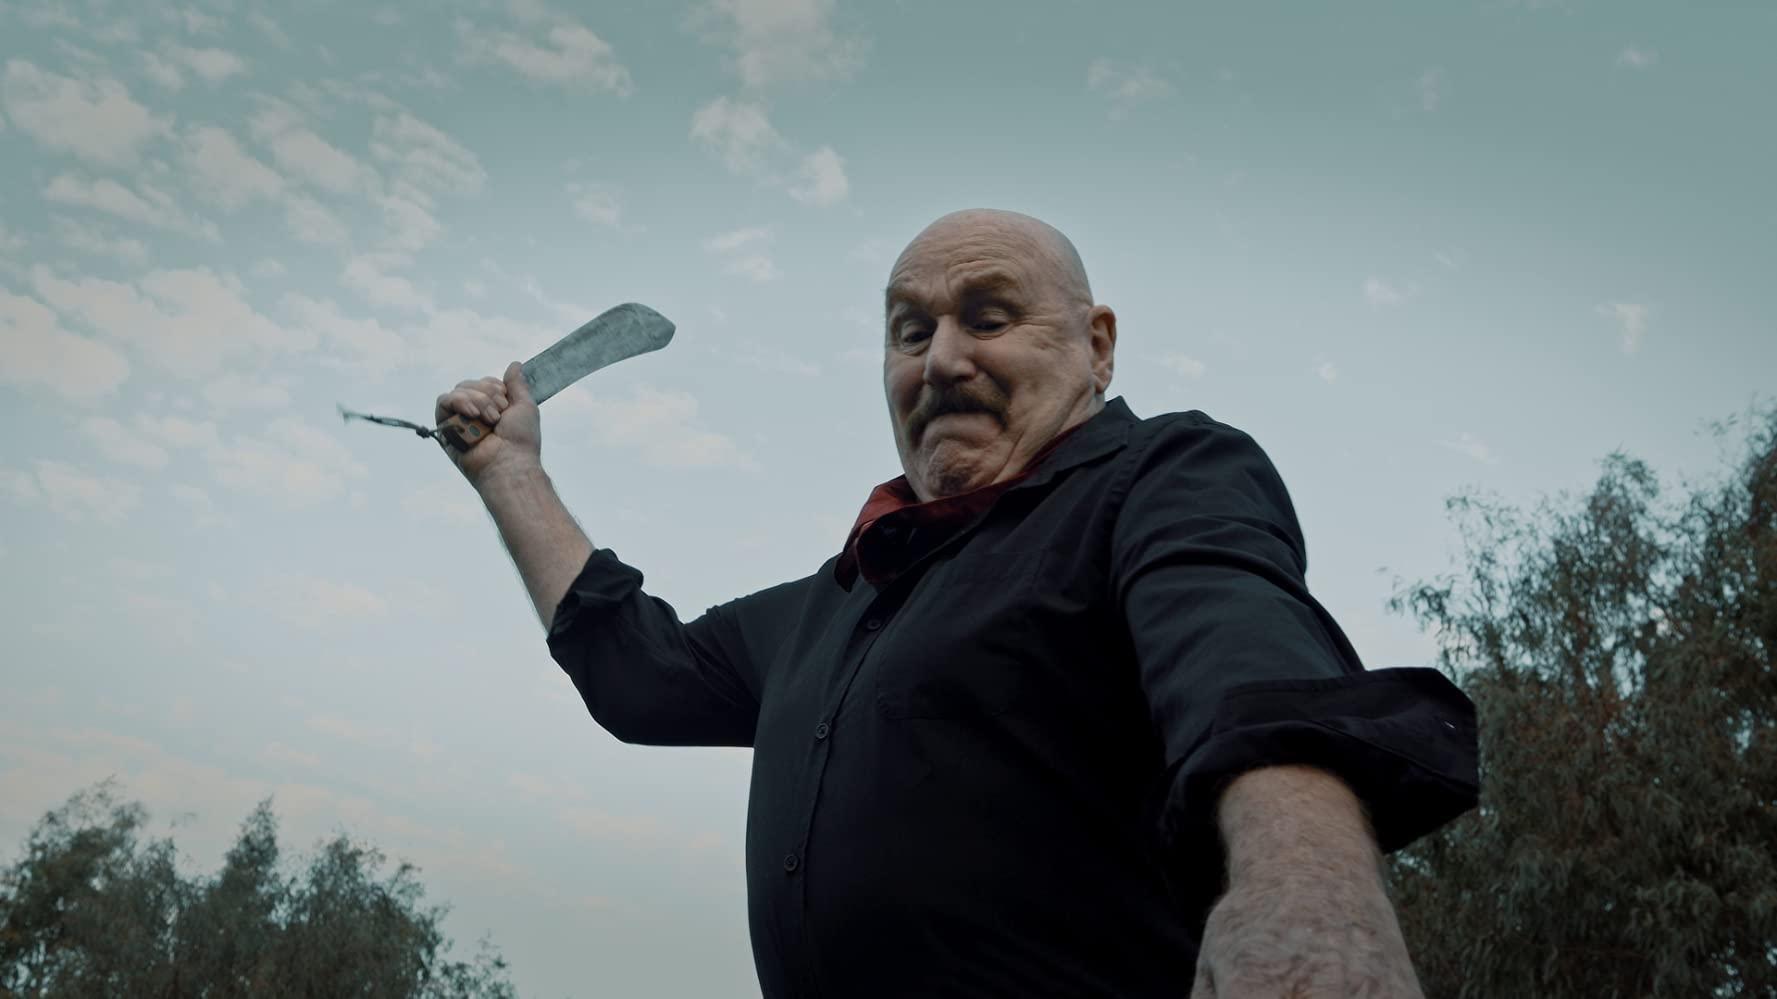 مشاهدة فيلم The Faceless Man (2019) مترجم HD اون لاين